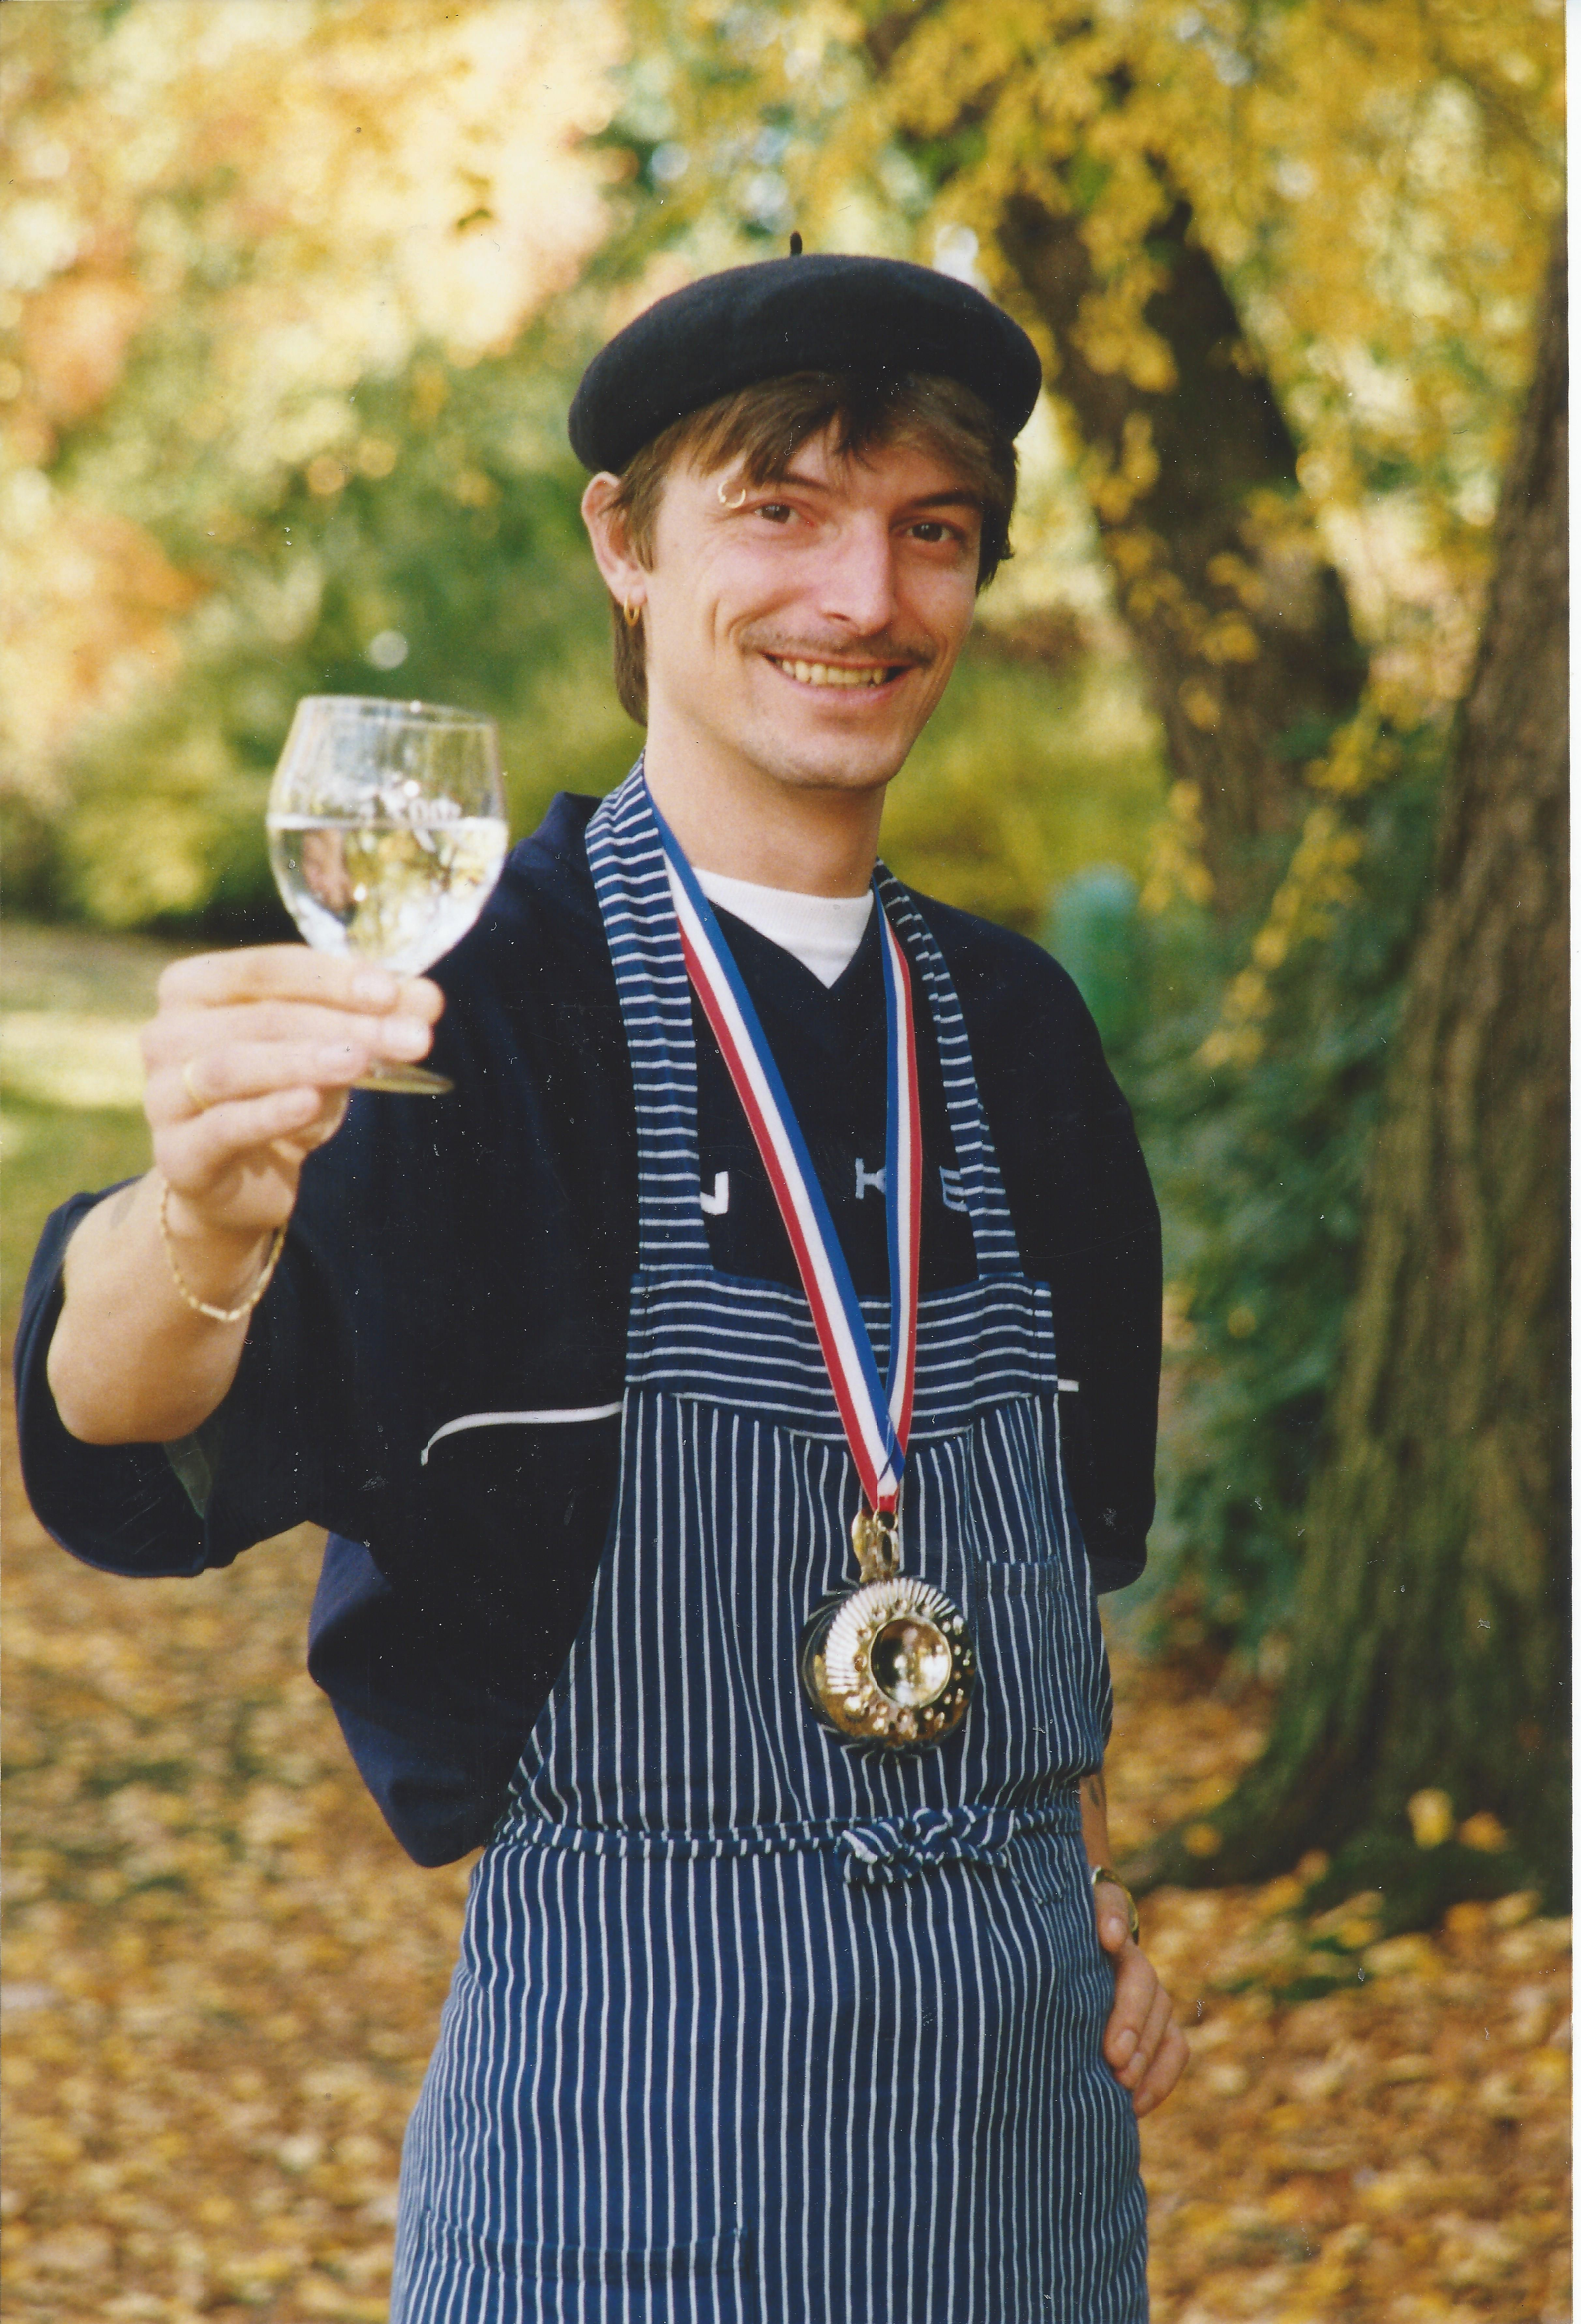 1999 - Robert vd Beek